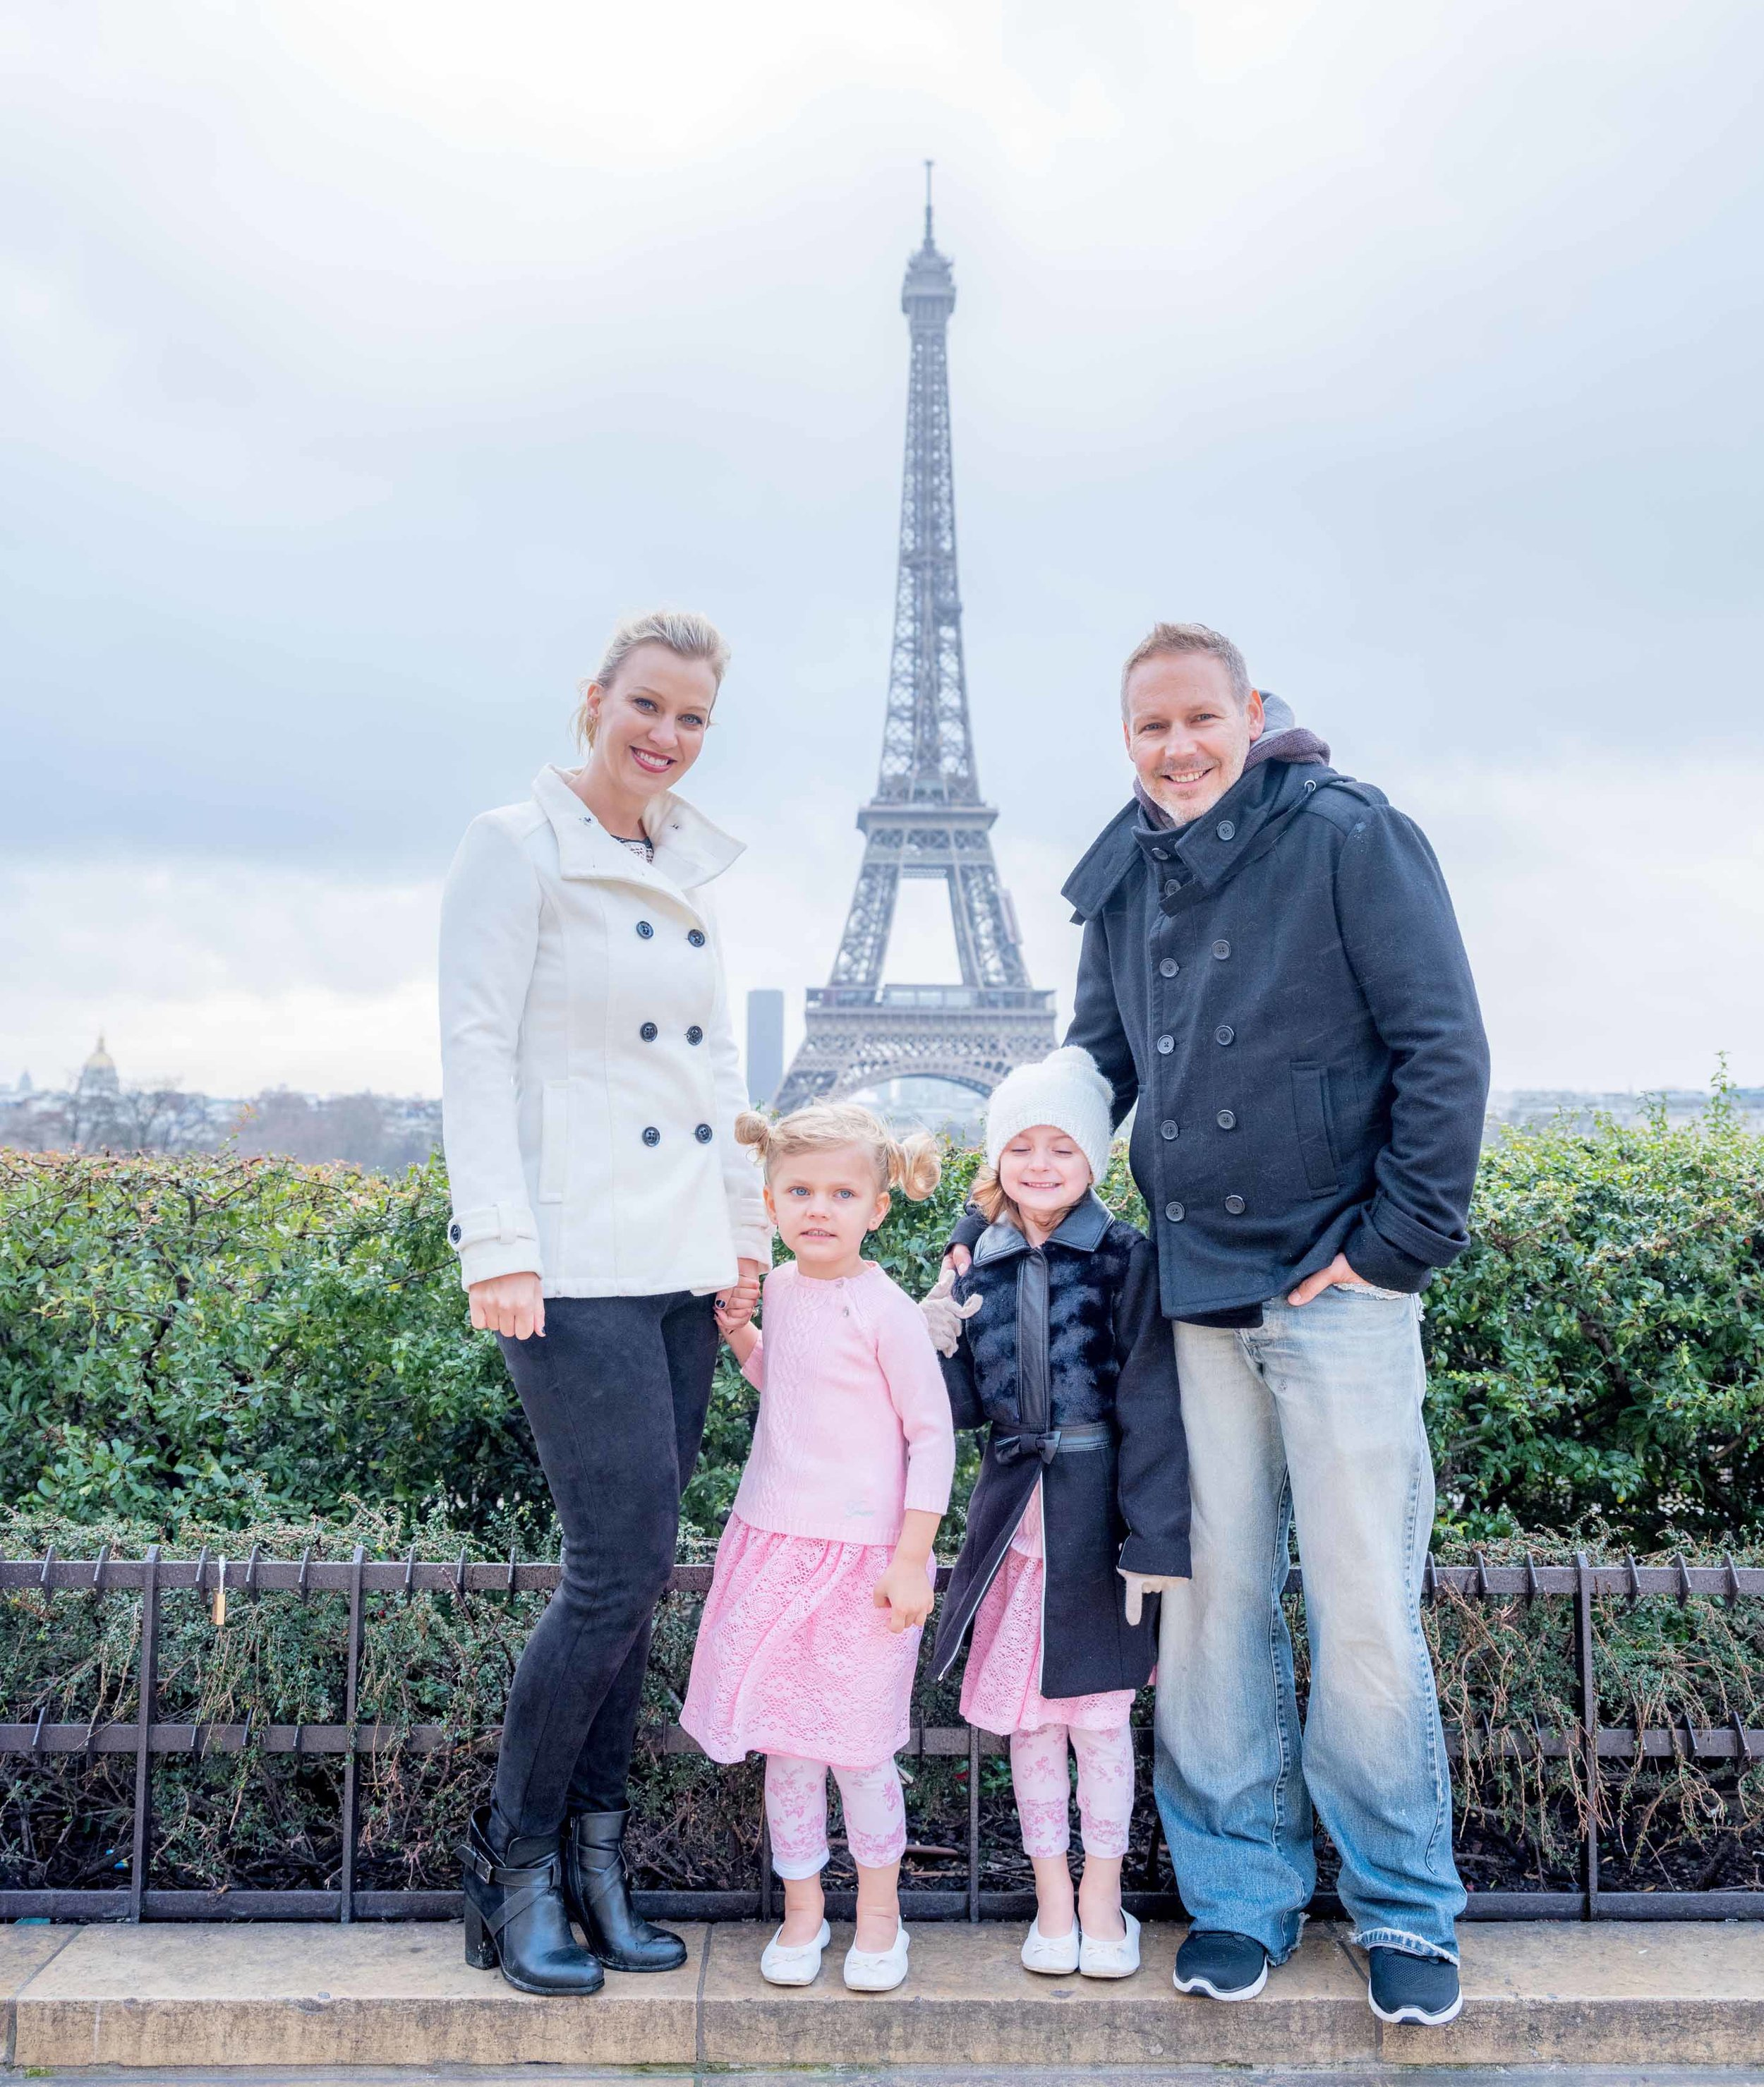 Family day in the Paris rain